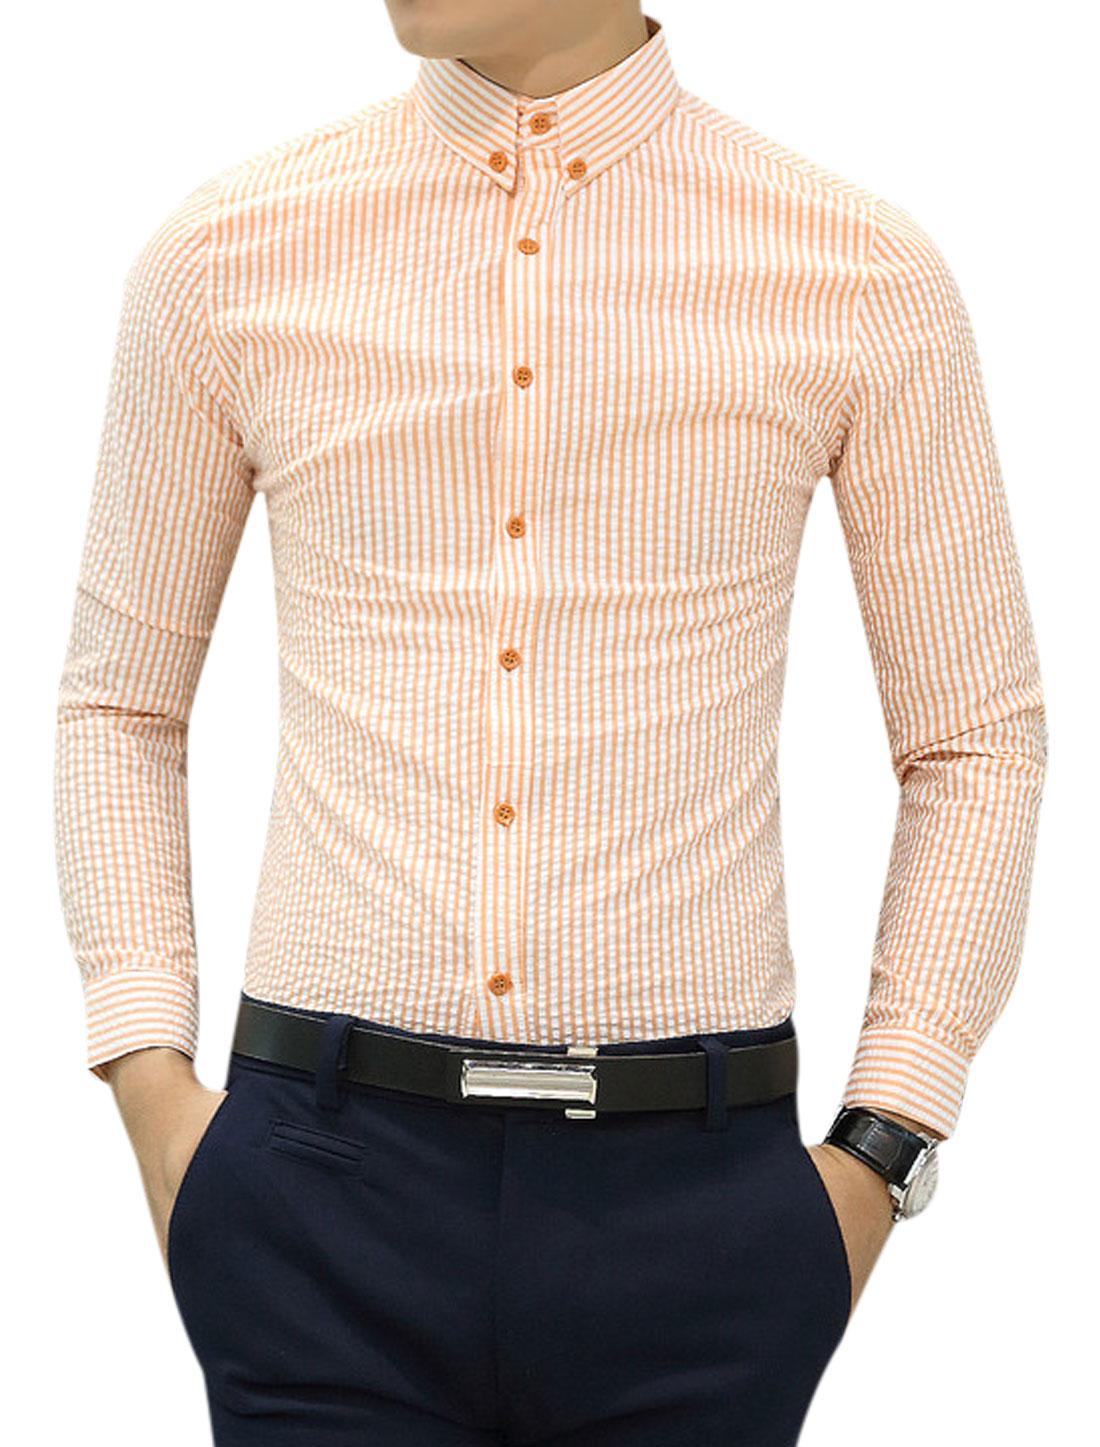 Stripes Long Sleeves Stylish Orange White Casual Shirt for Man S